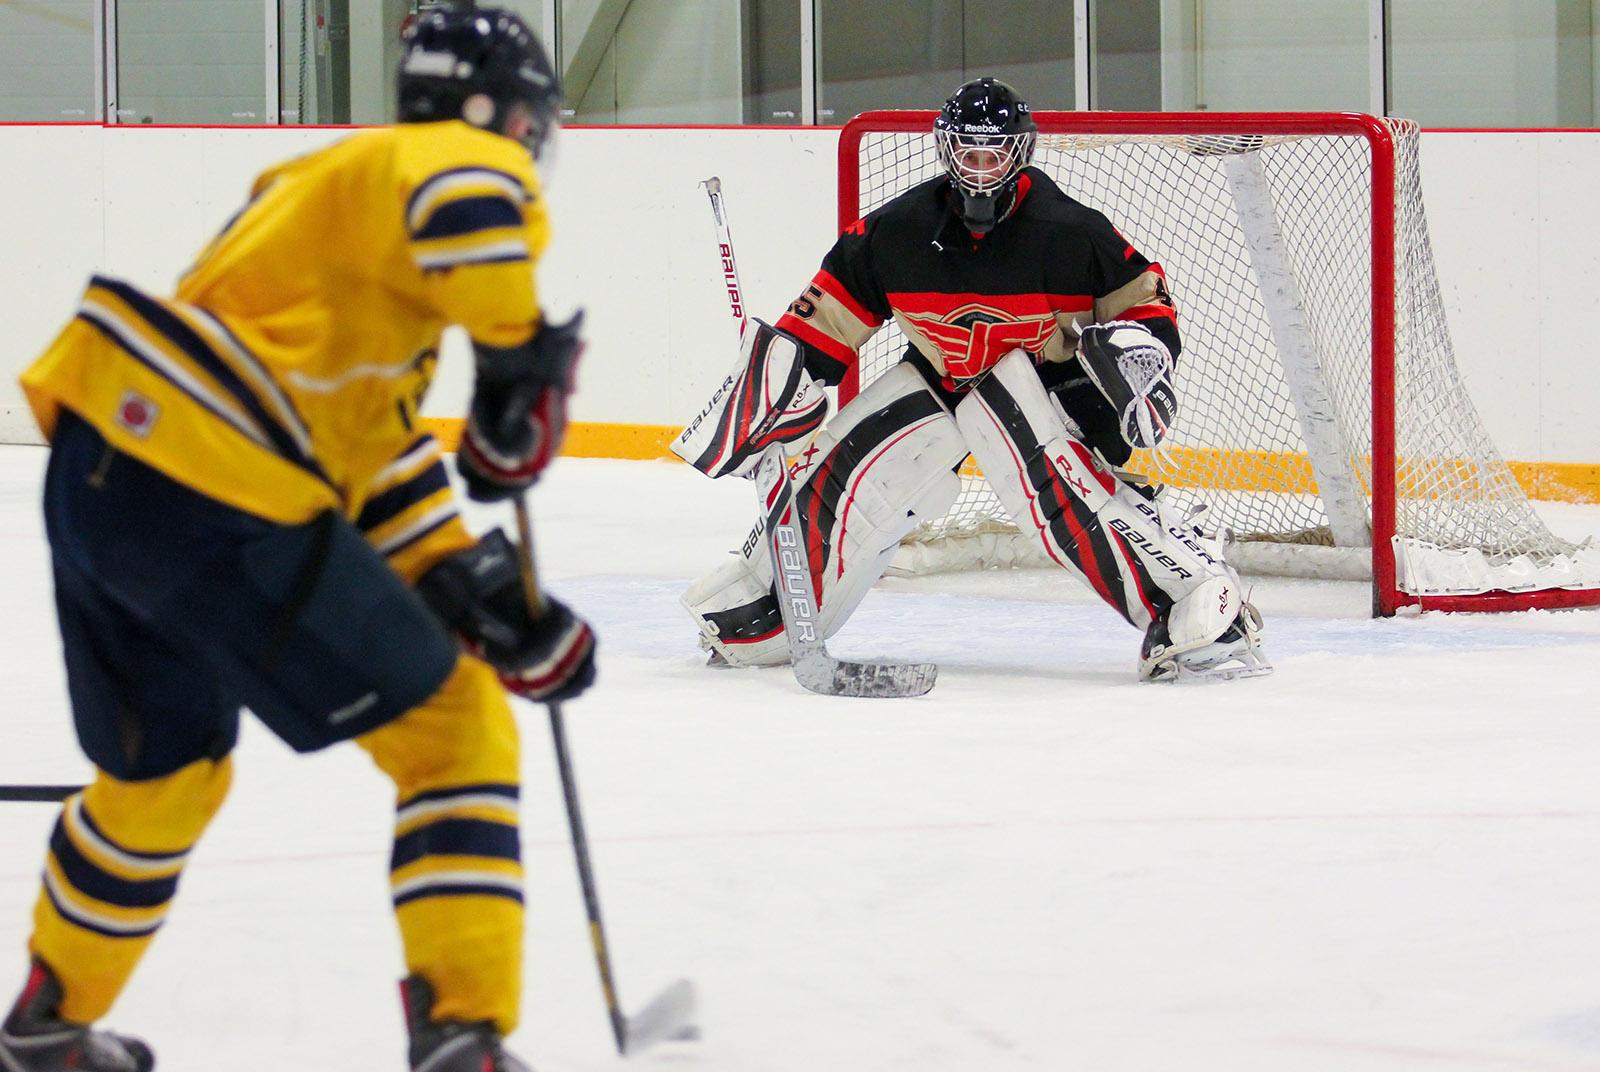 Hockey Photography: Choosing Your ISO